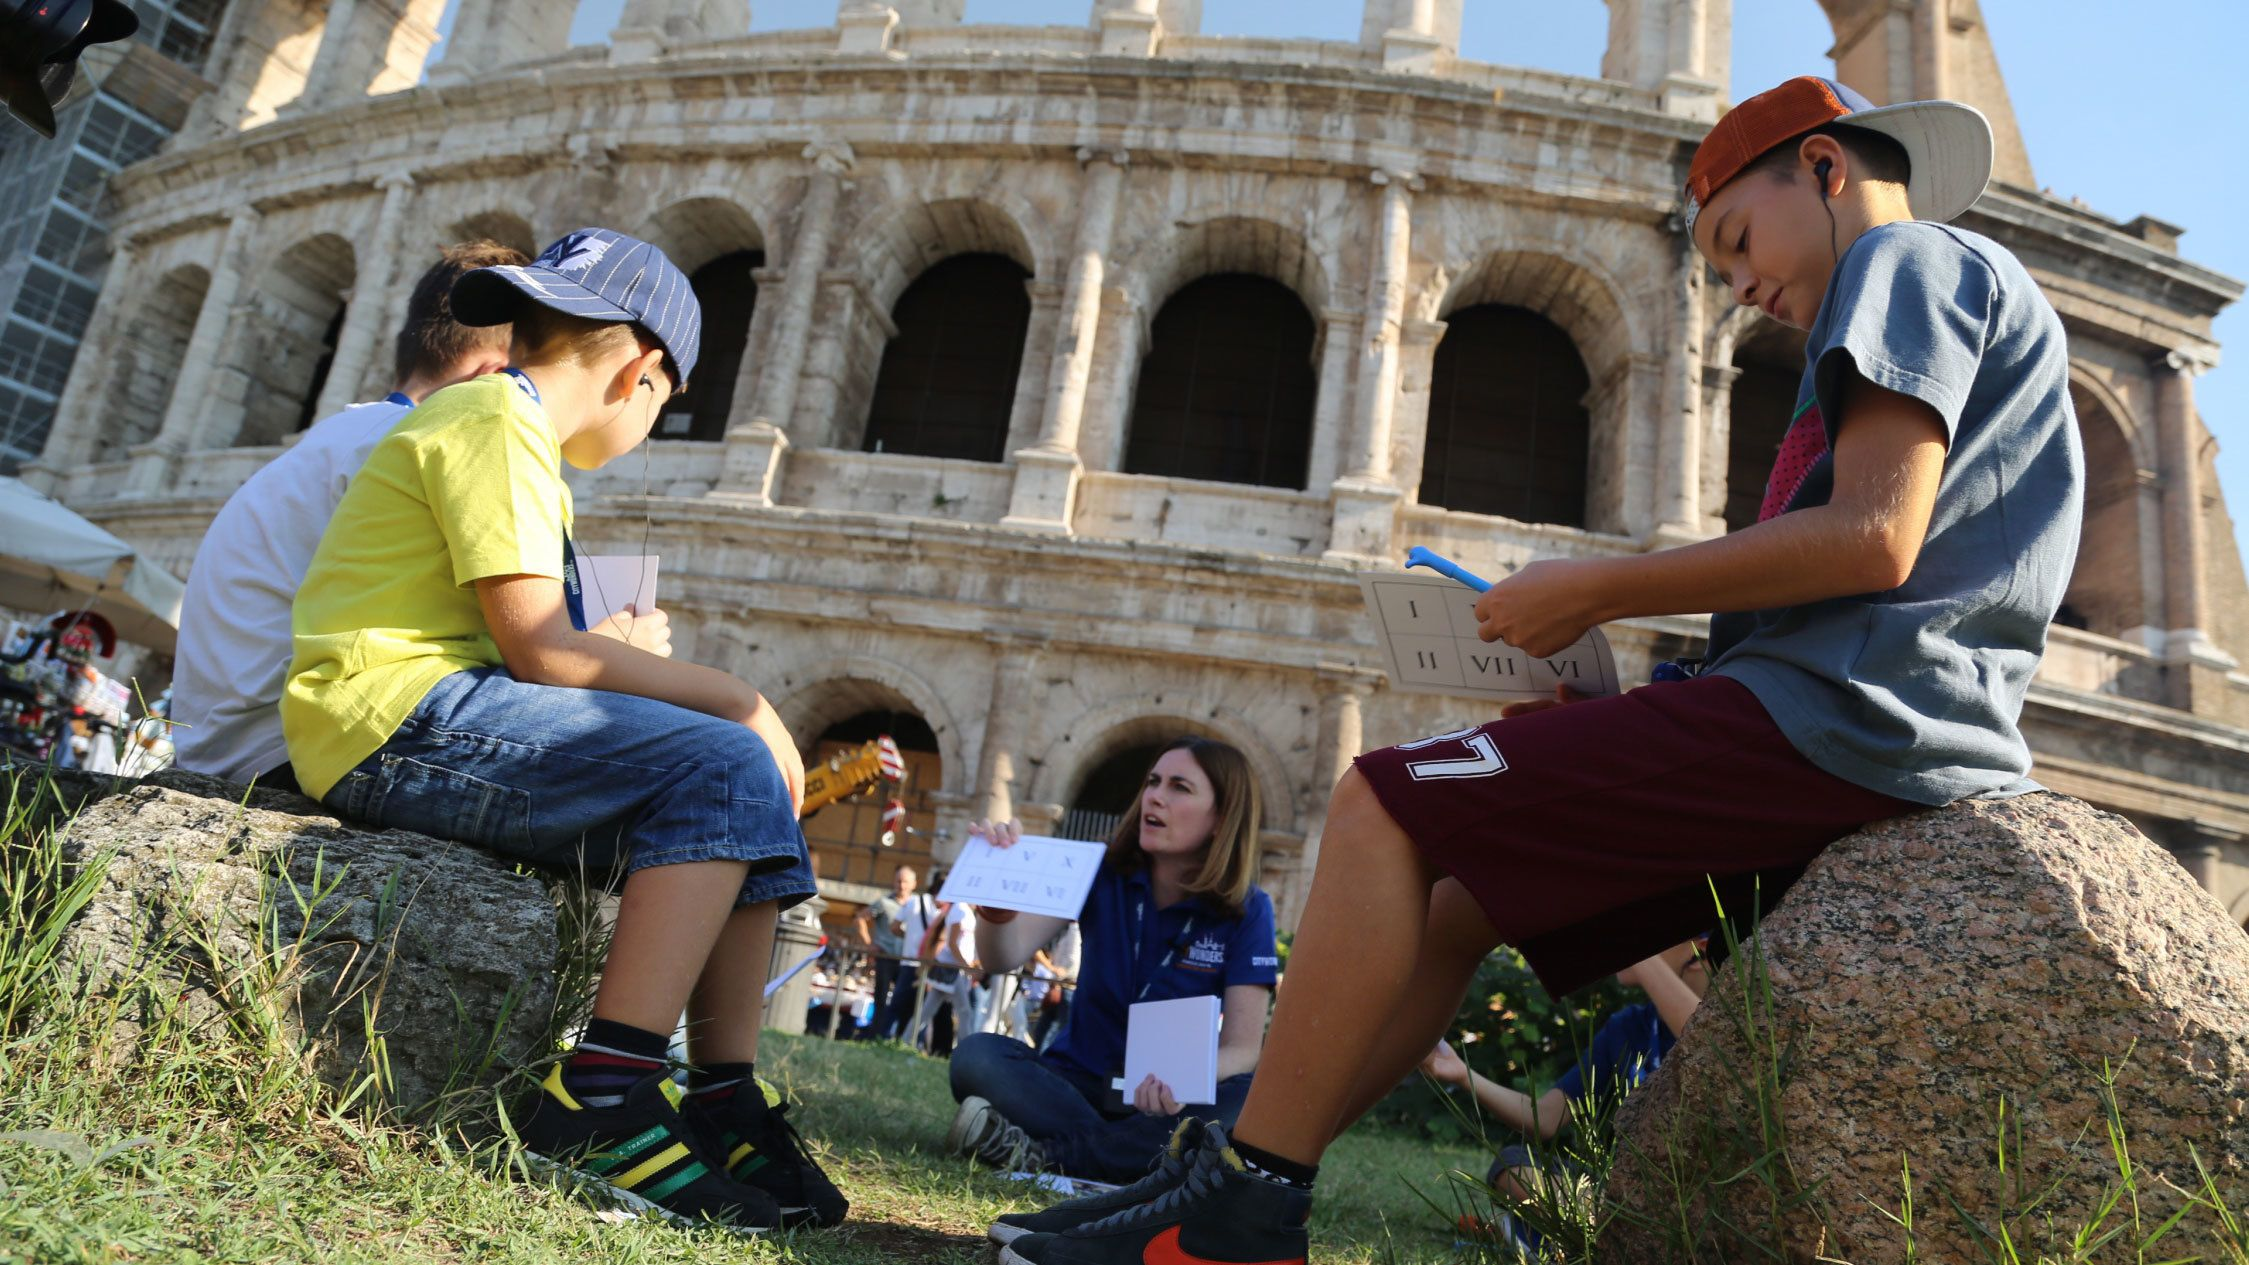 Først i køen: Familietur til Colosseum med keisere og gladiatorer